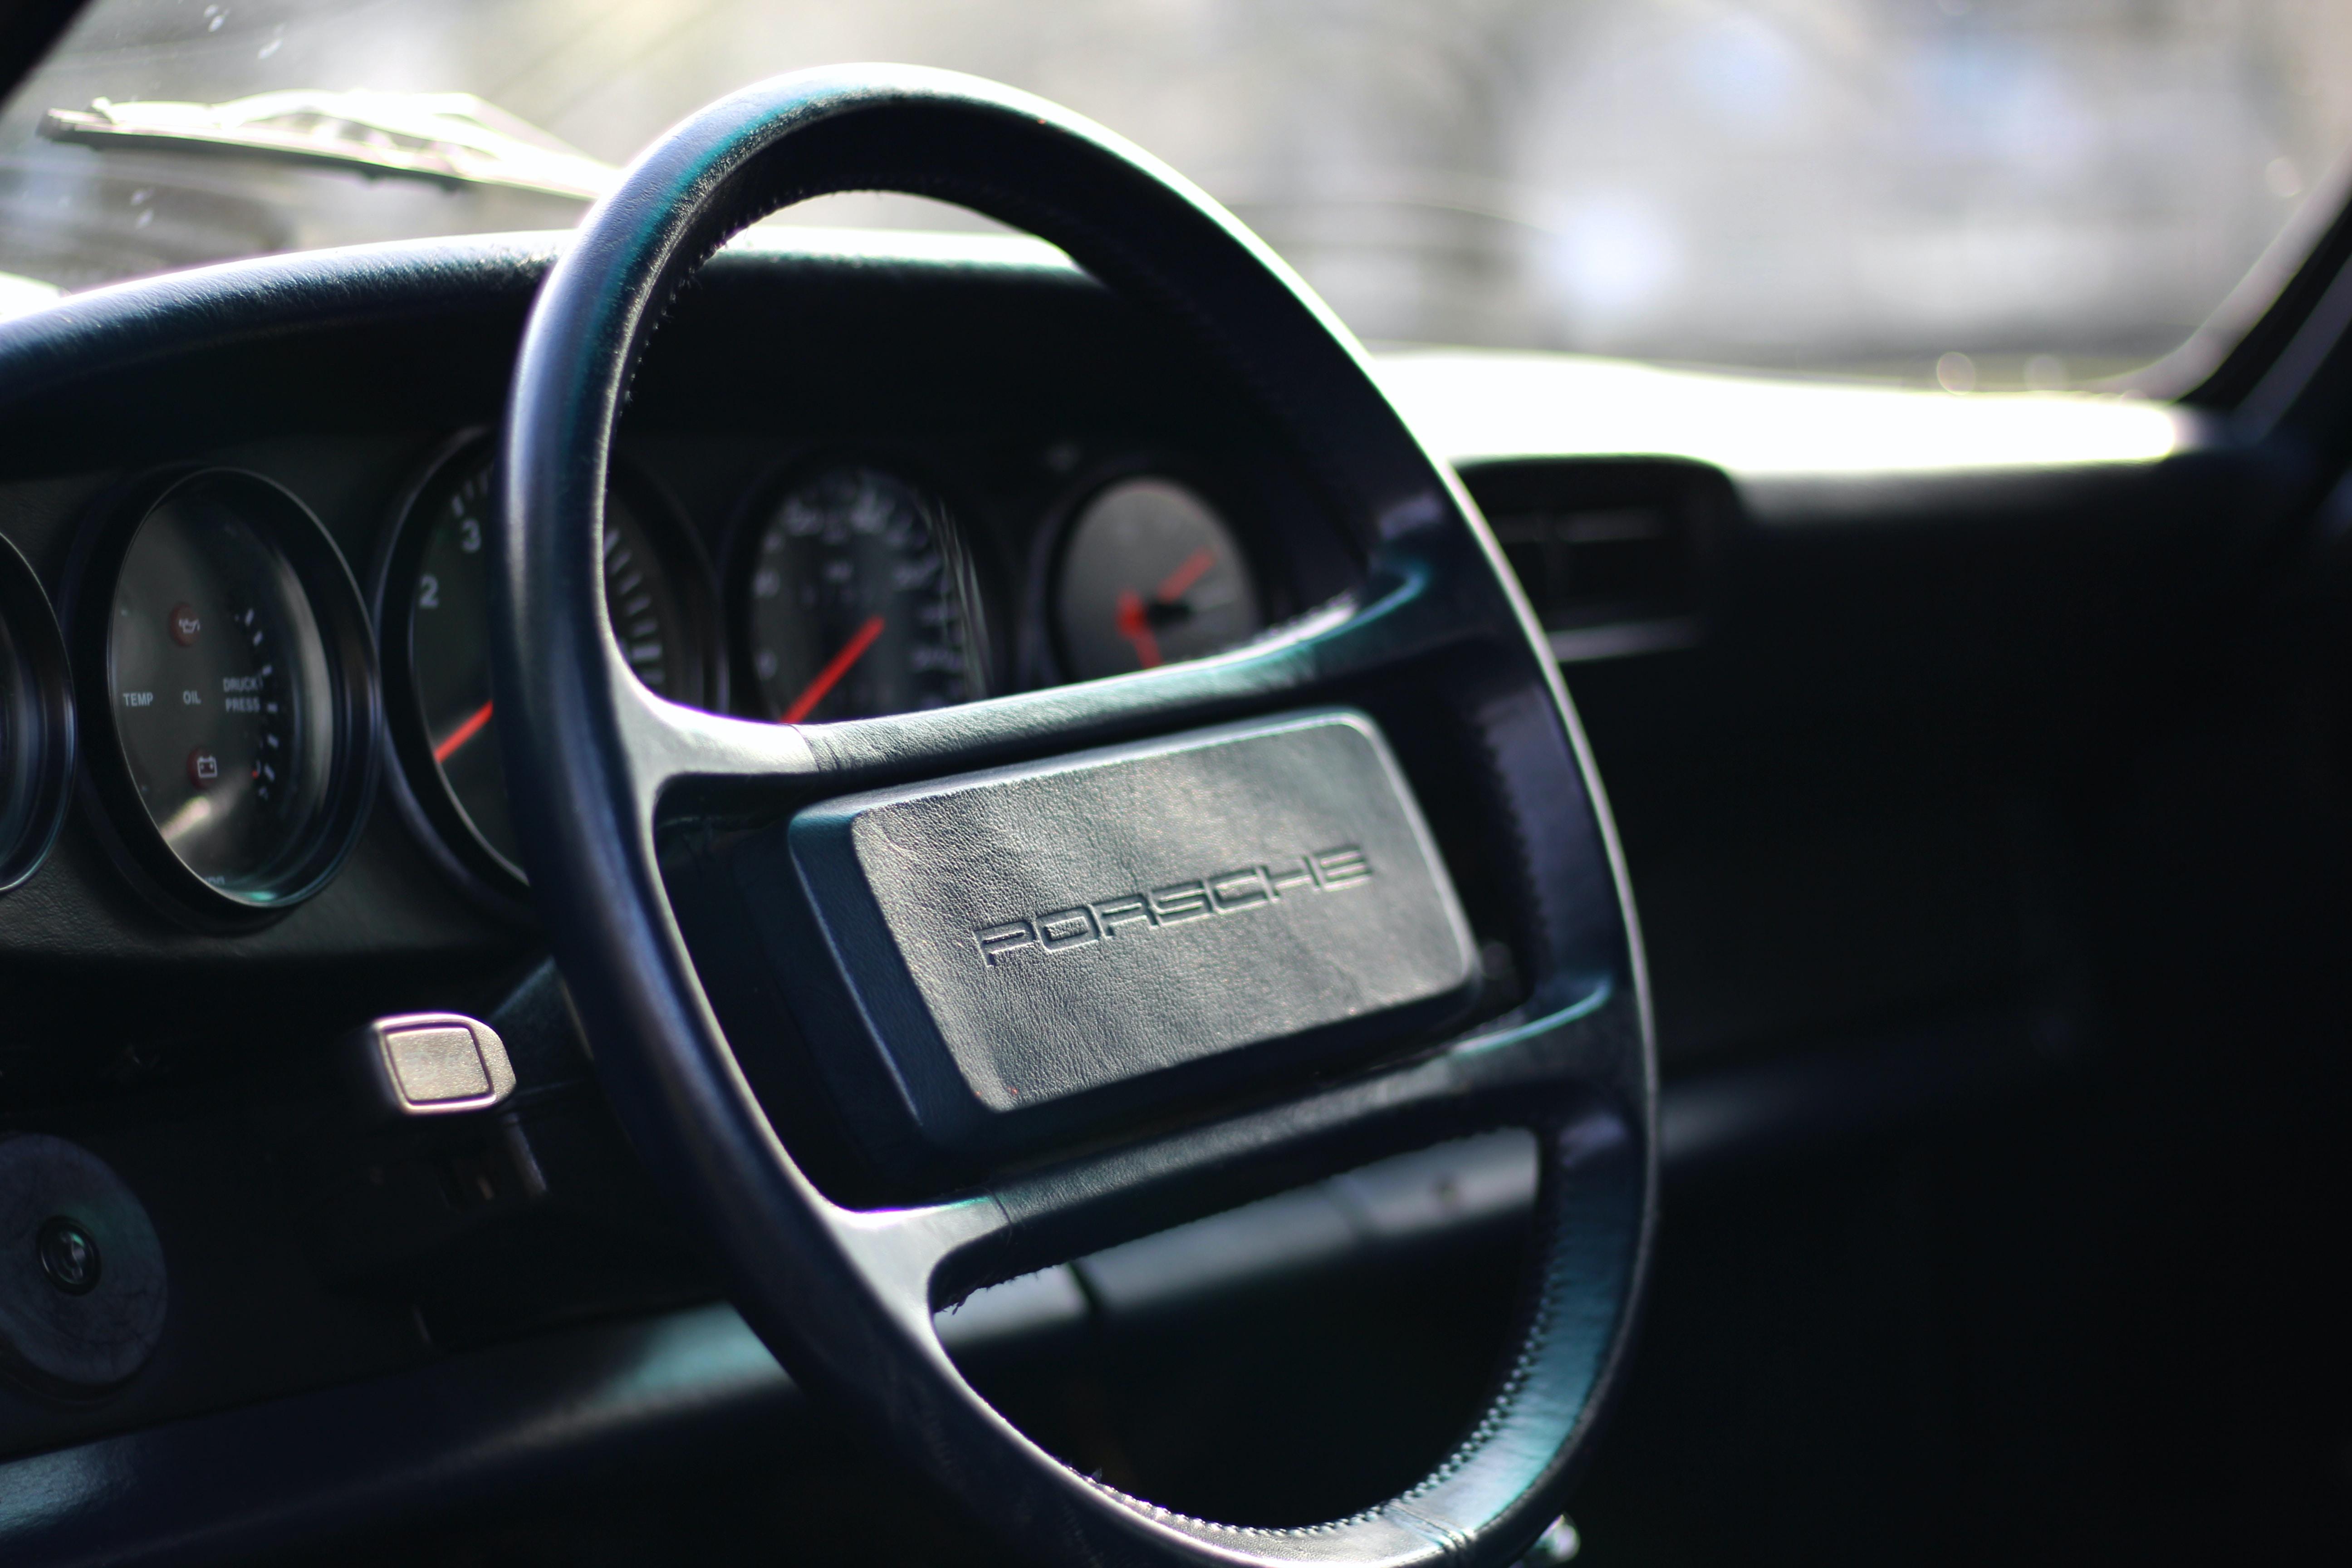 selective focus photography of black Porsche steering wheel